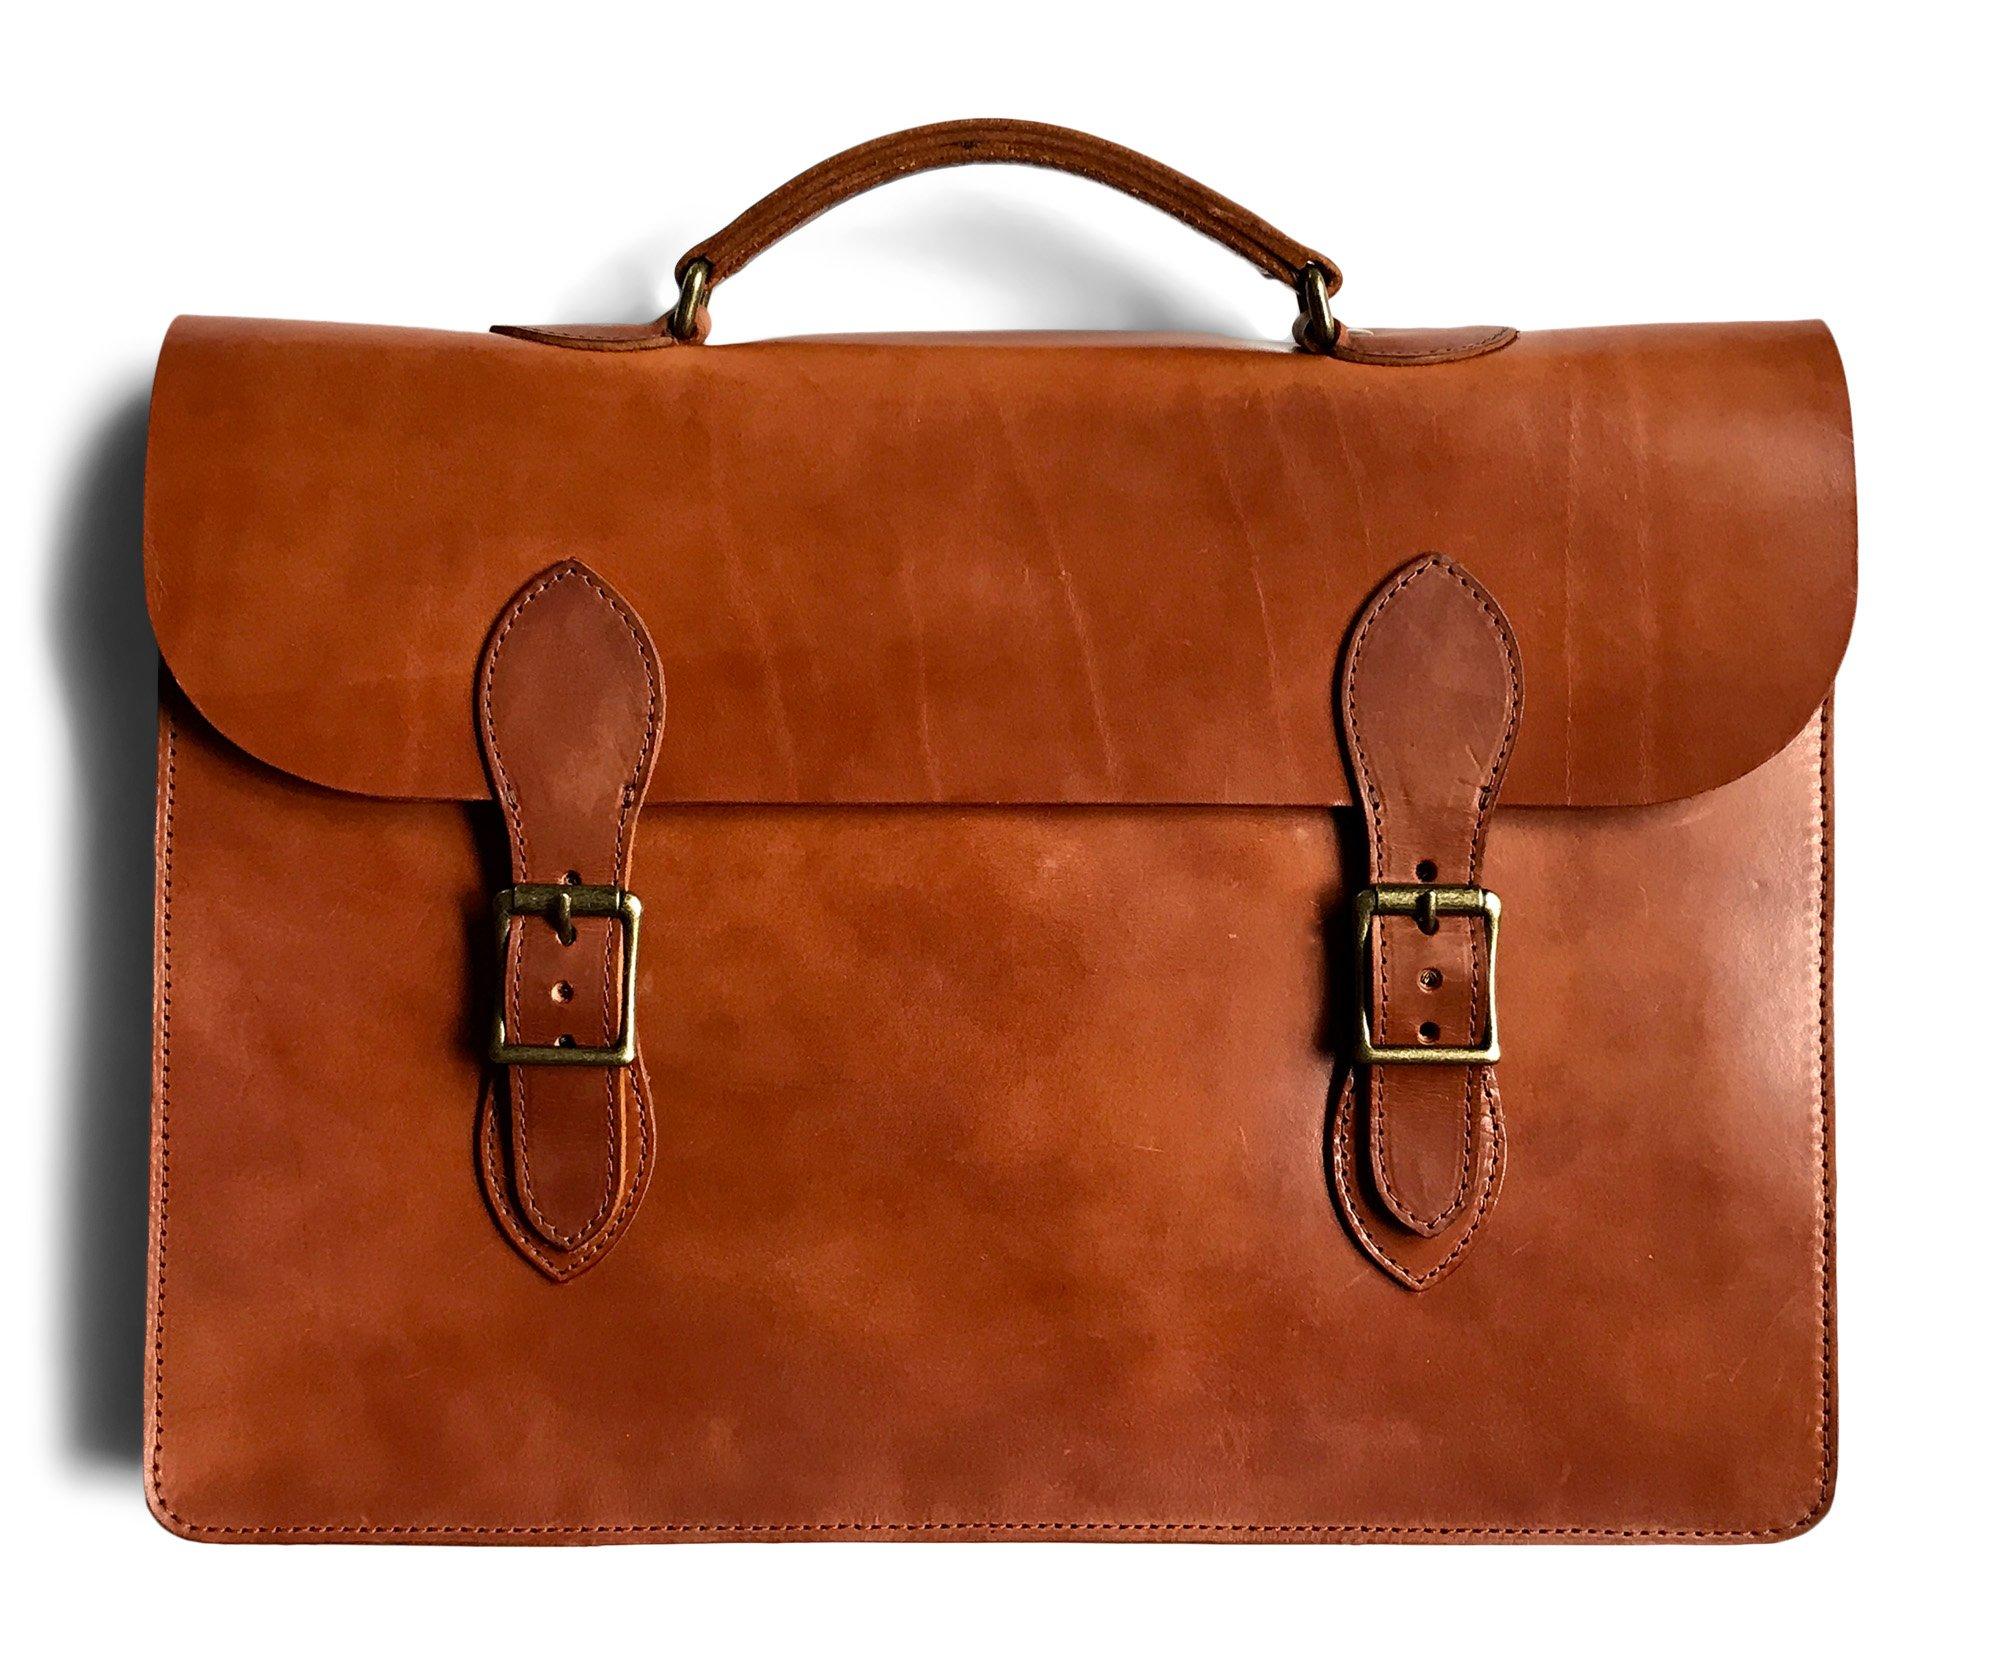 Jackson Wayne Vintage Leather Attache Laptop Case (Saddle Tan)